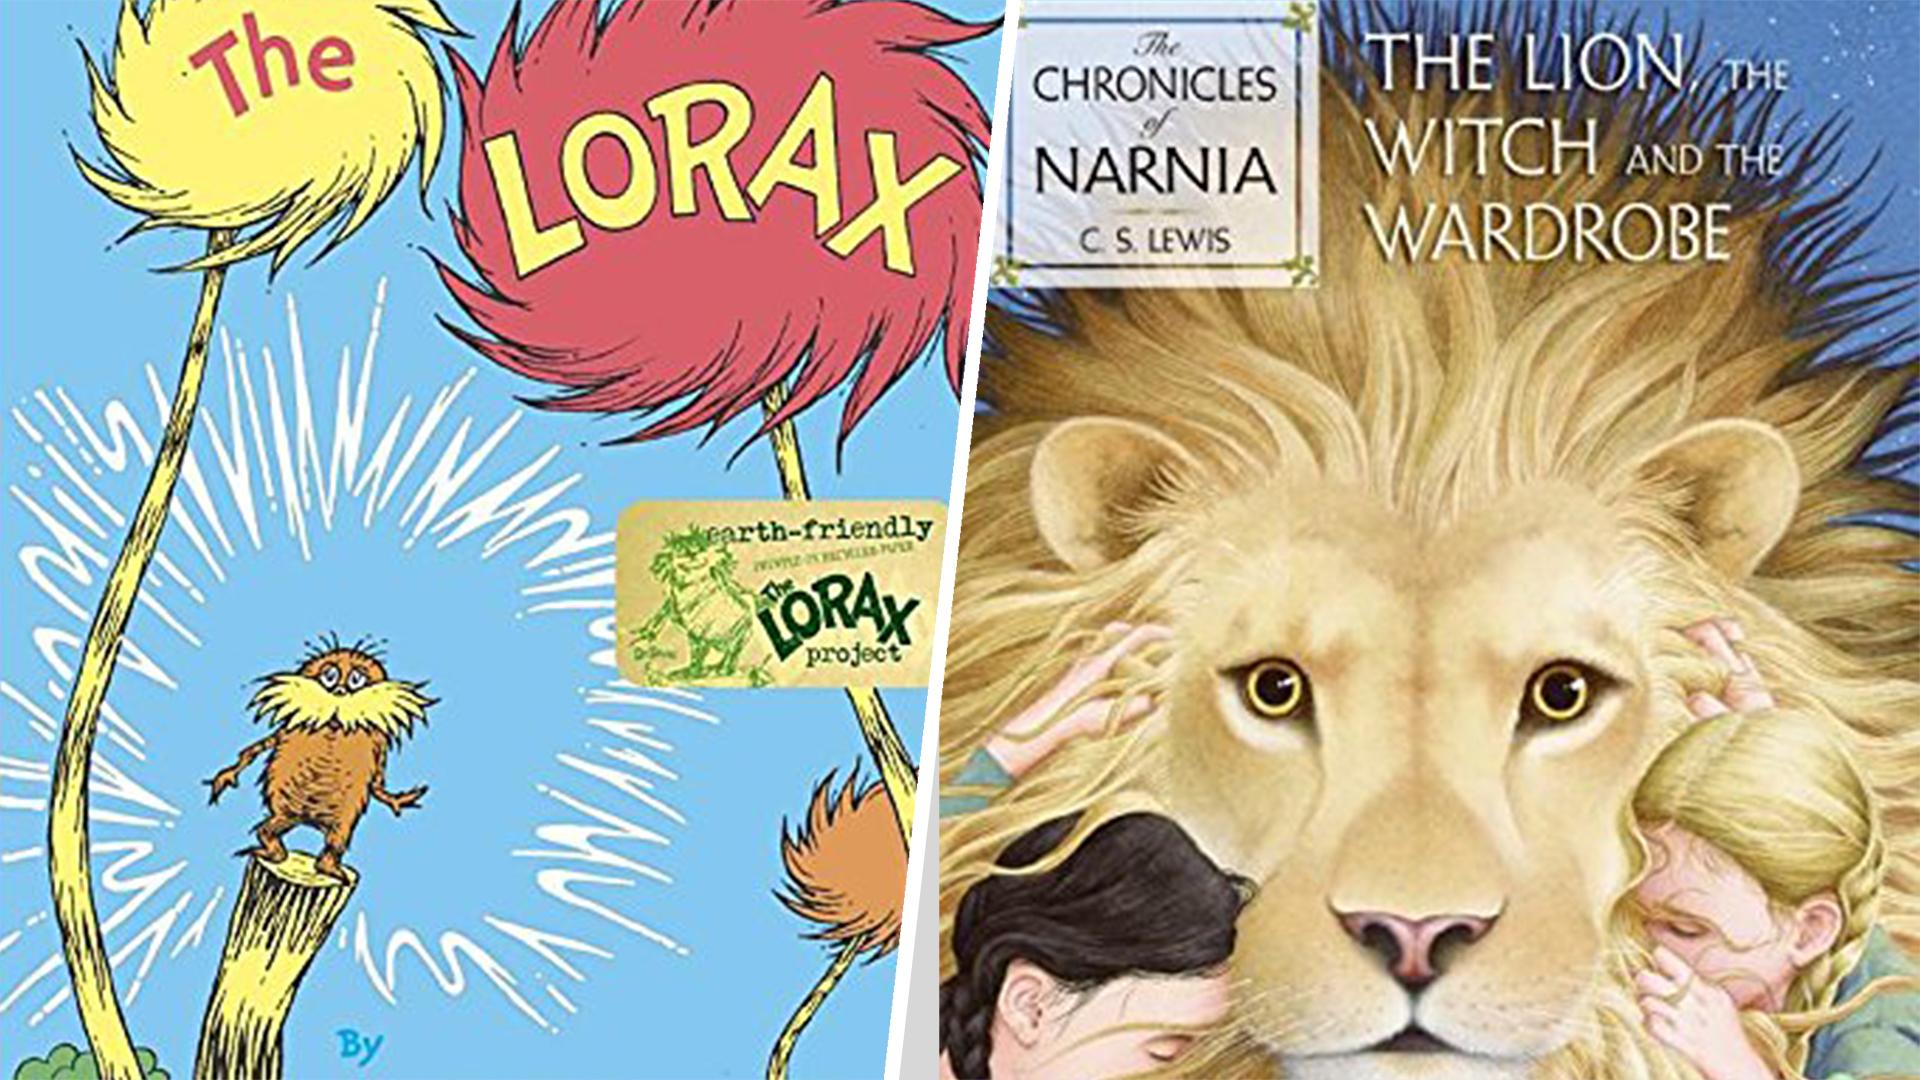 childrens-books-170330-tease_ab3571f568d95ece4f972d7b3ac4f7a6.jpg